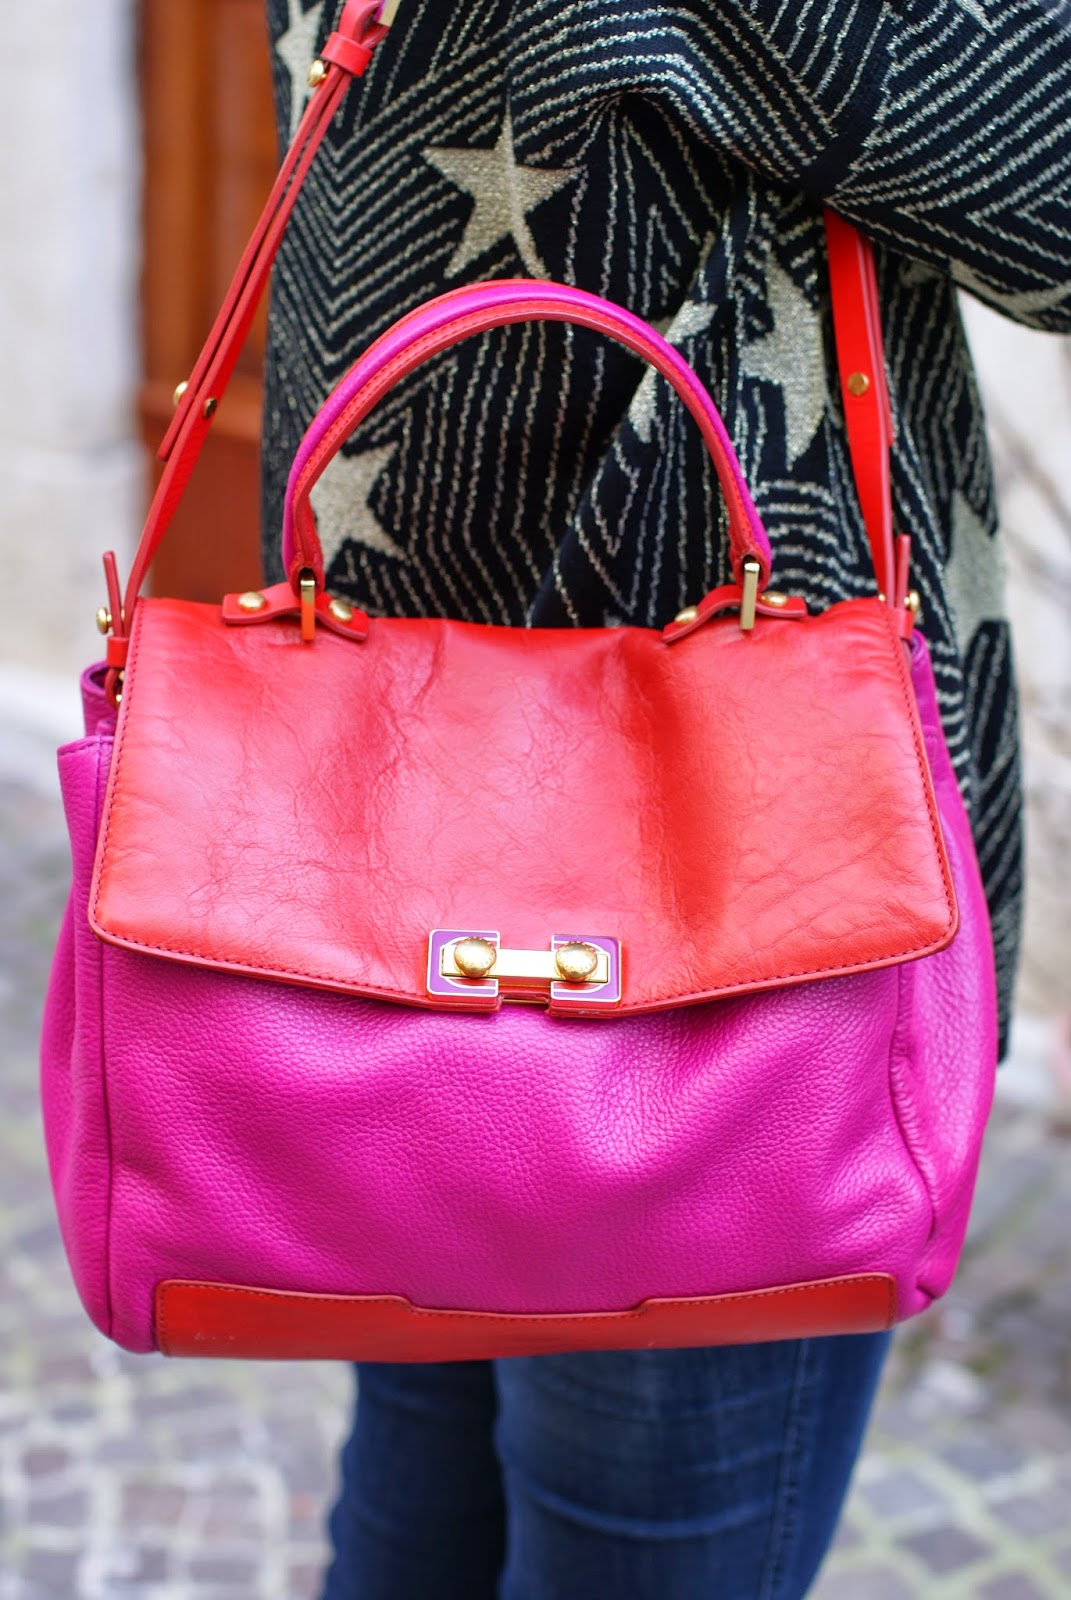 Marc by Marc Jacobs color block Bob's Memphis satchel, Fashion and Cookies, fashion blogger